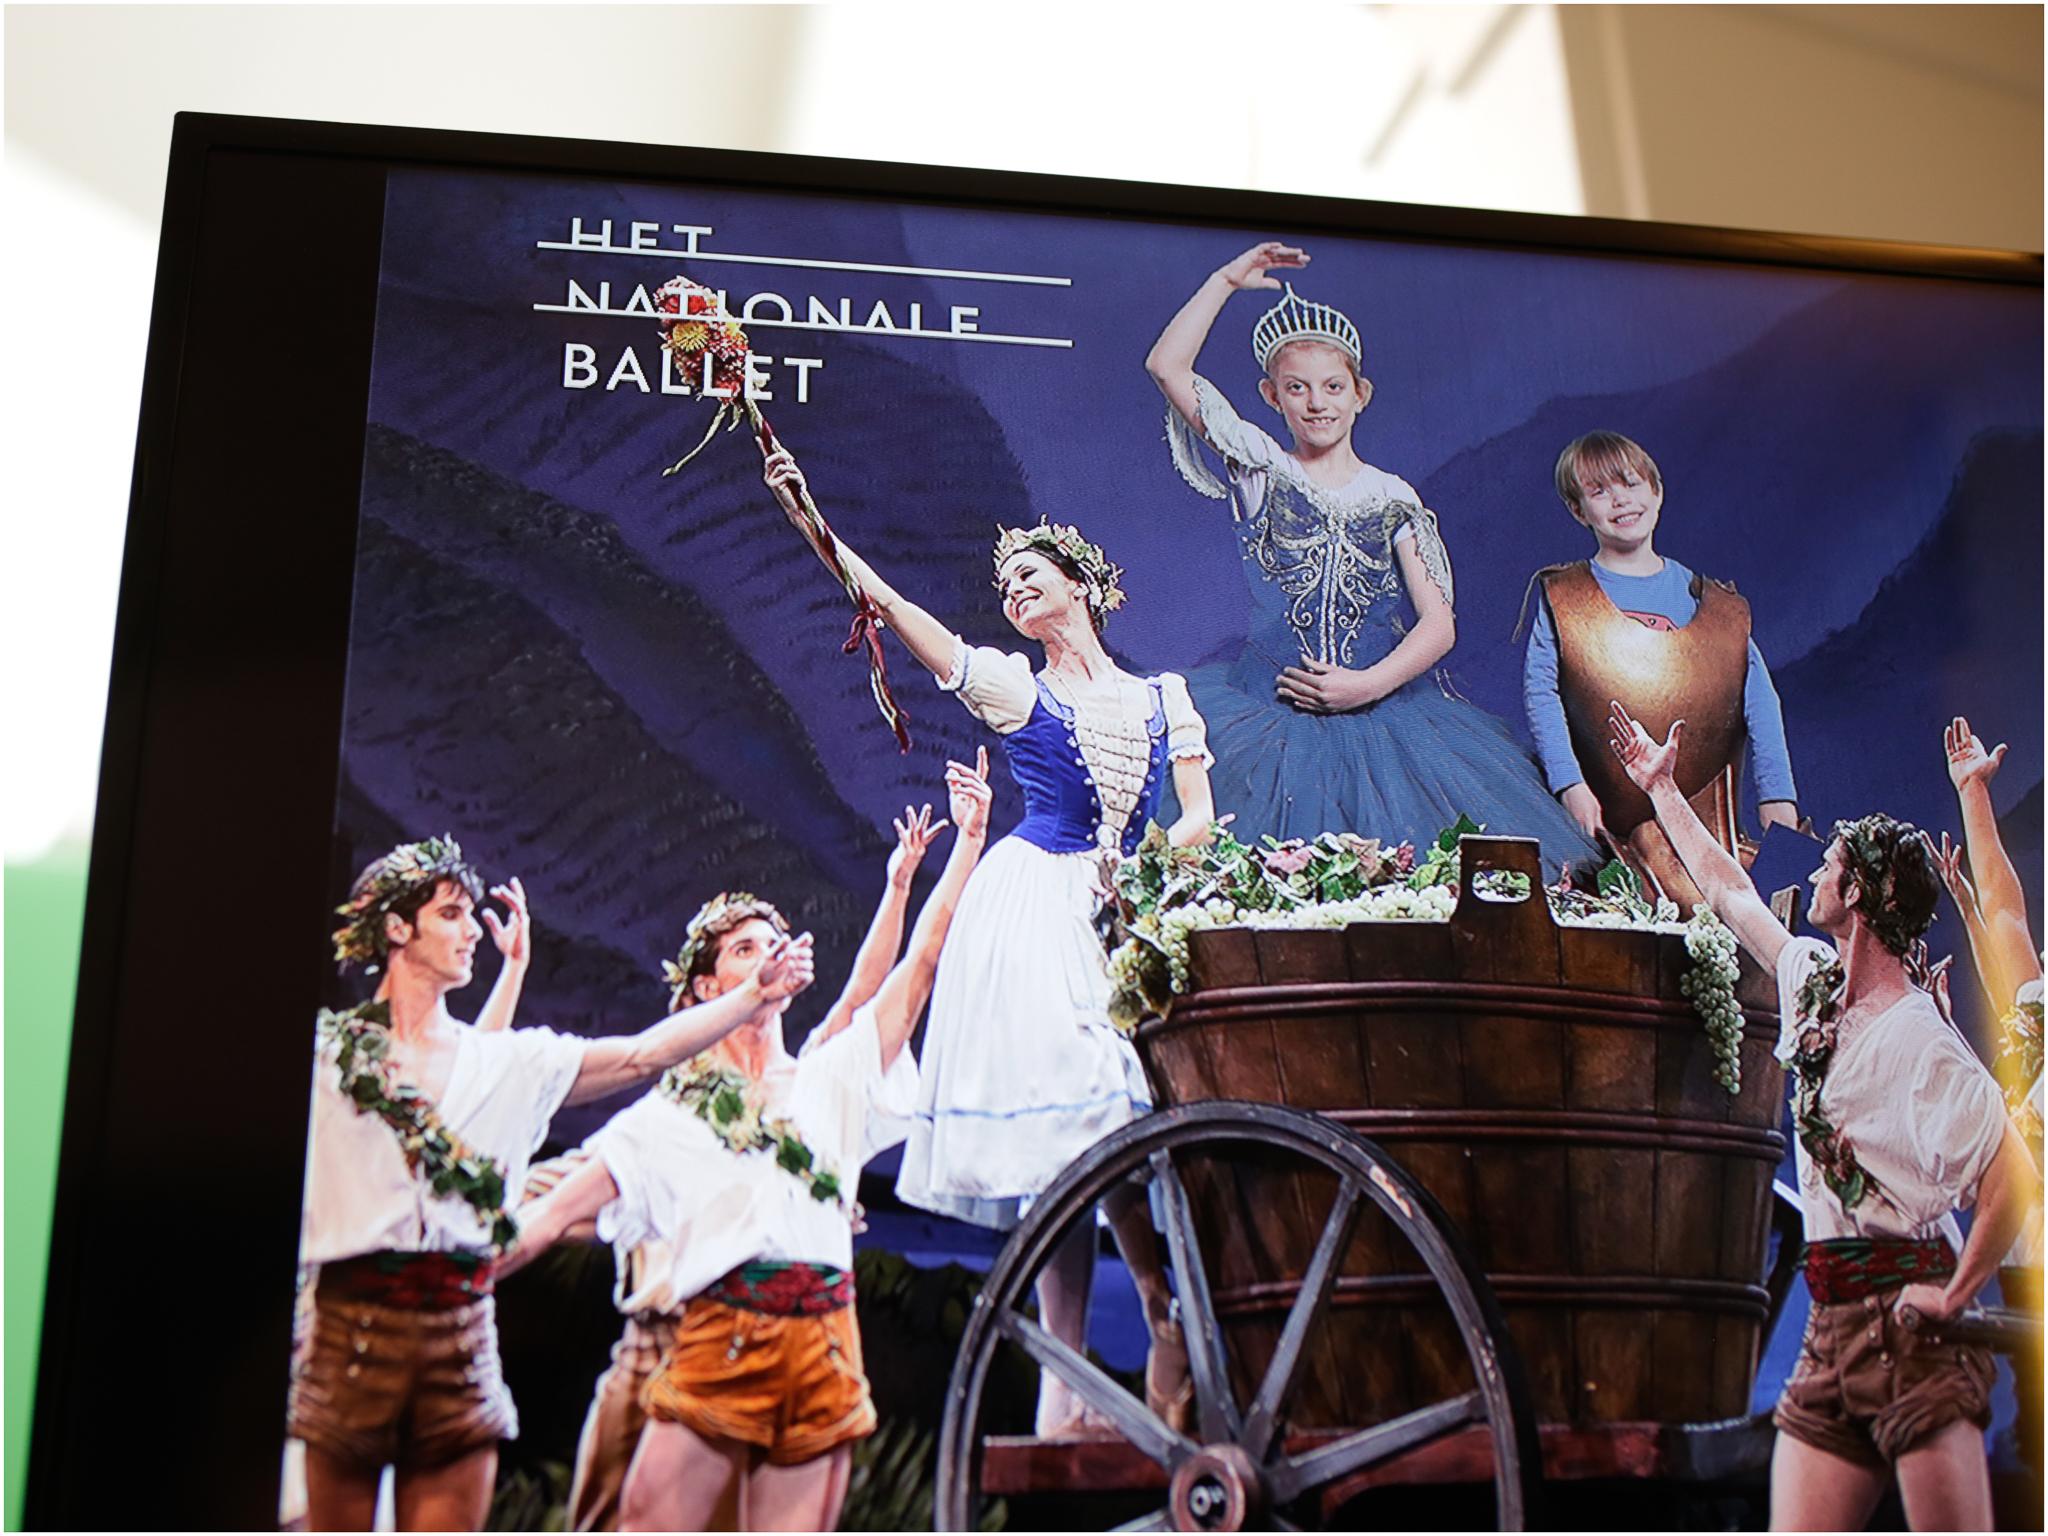 002_Fotografie Nationale Opera Ballet.jpg